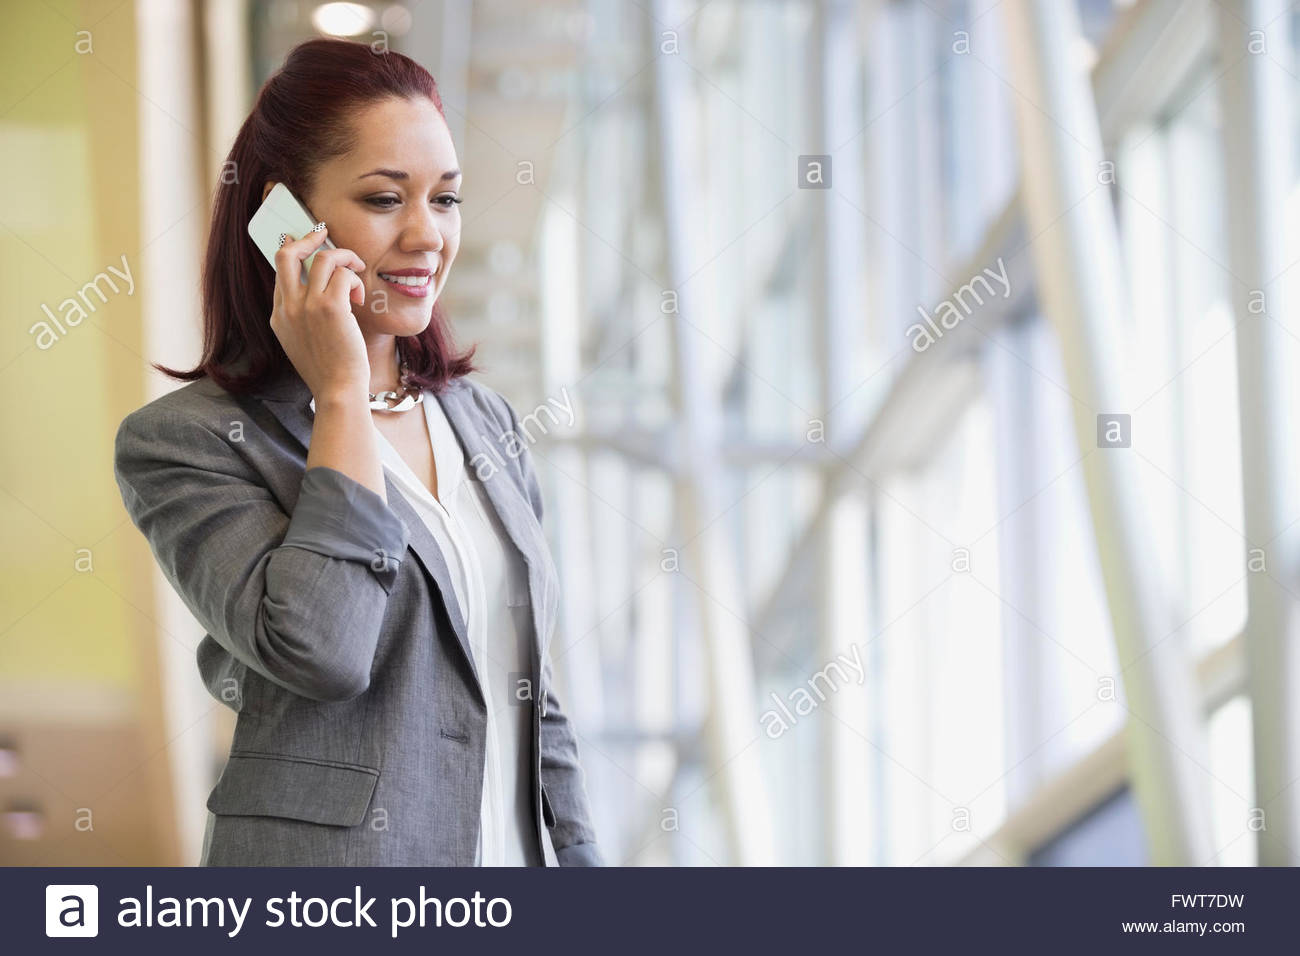 Junge Geschäftsfrau Beantwortung Handy im Büro Stockbild